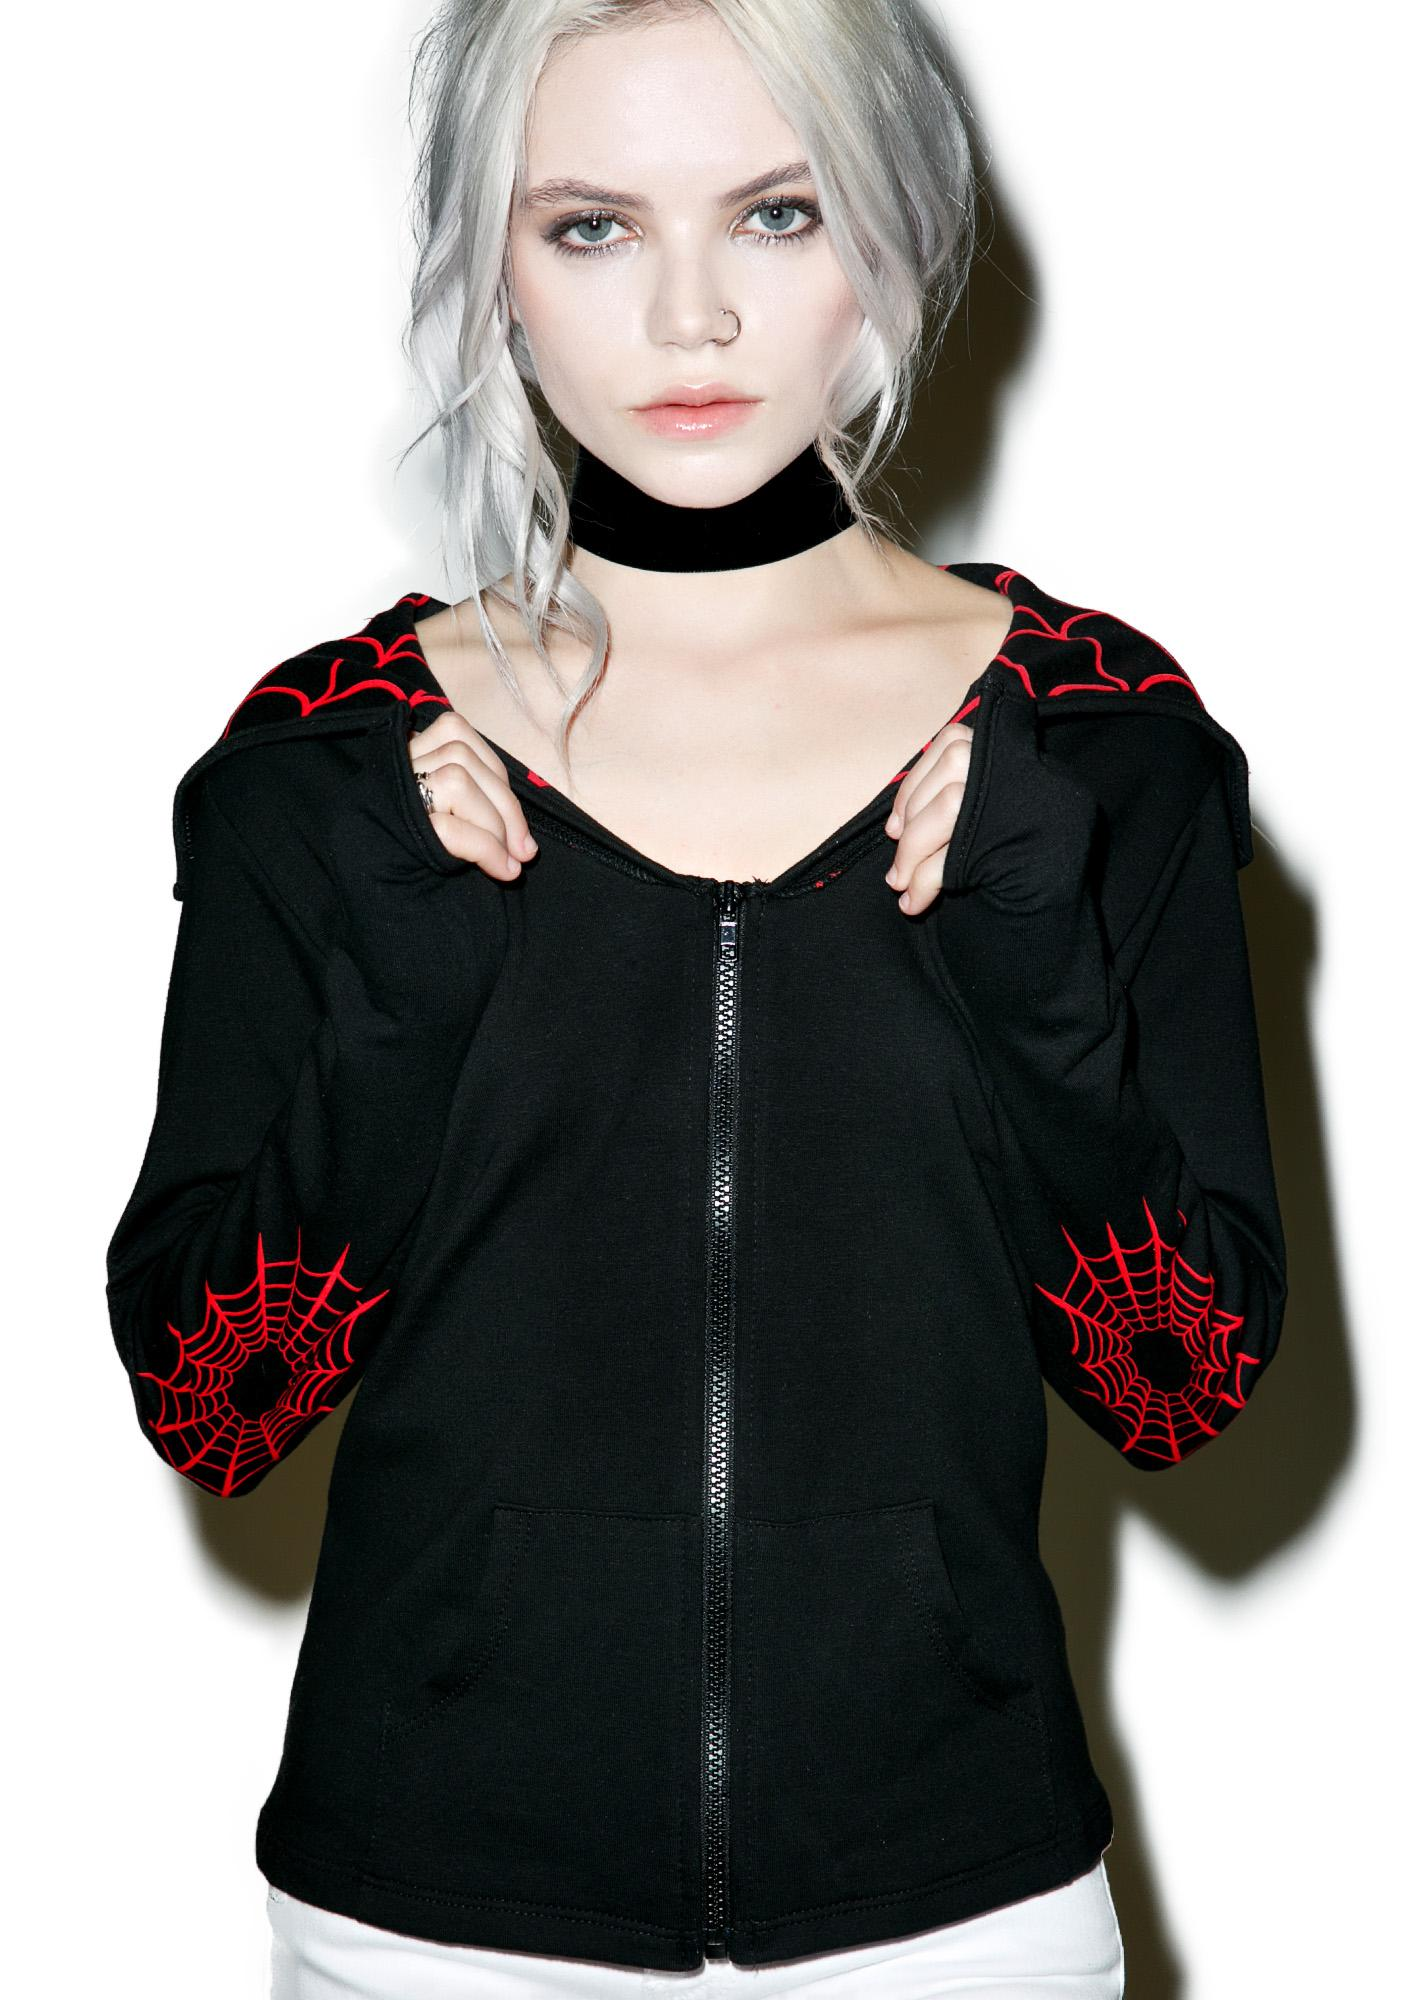 Kreepsville 666 Spiderweb Horror Bat Flap Jacket